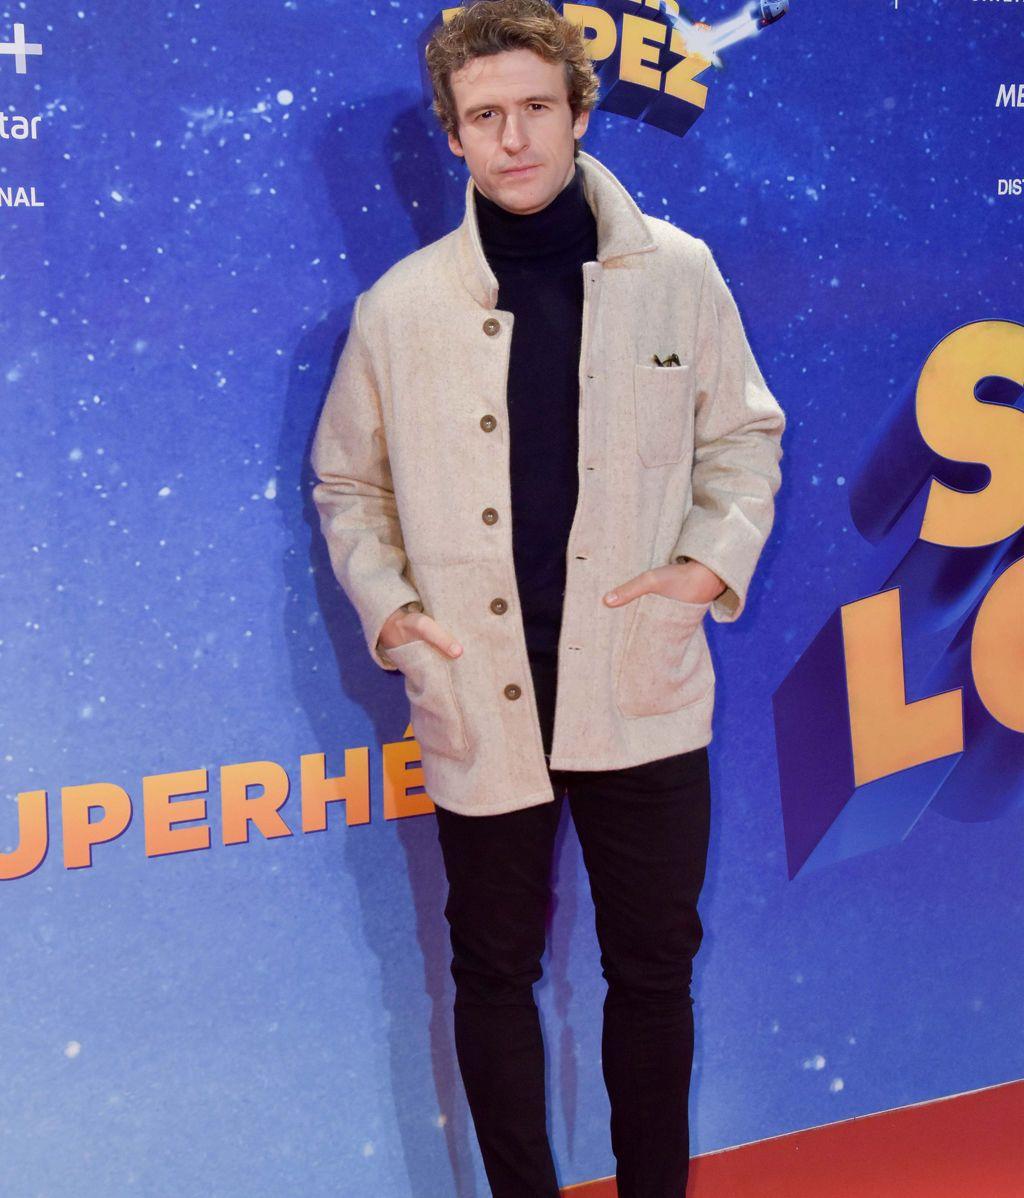 'Superlópez' salta del tebeo al estreno: Los vips que acompañaron a Dani Rovira